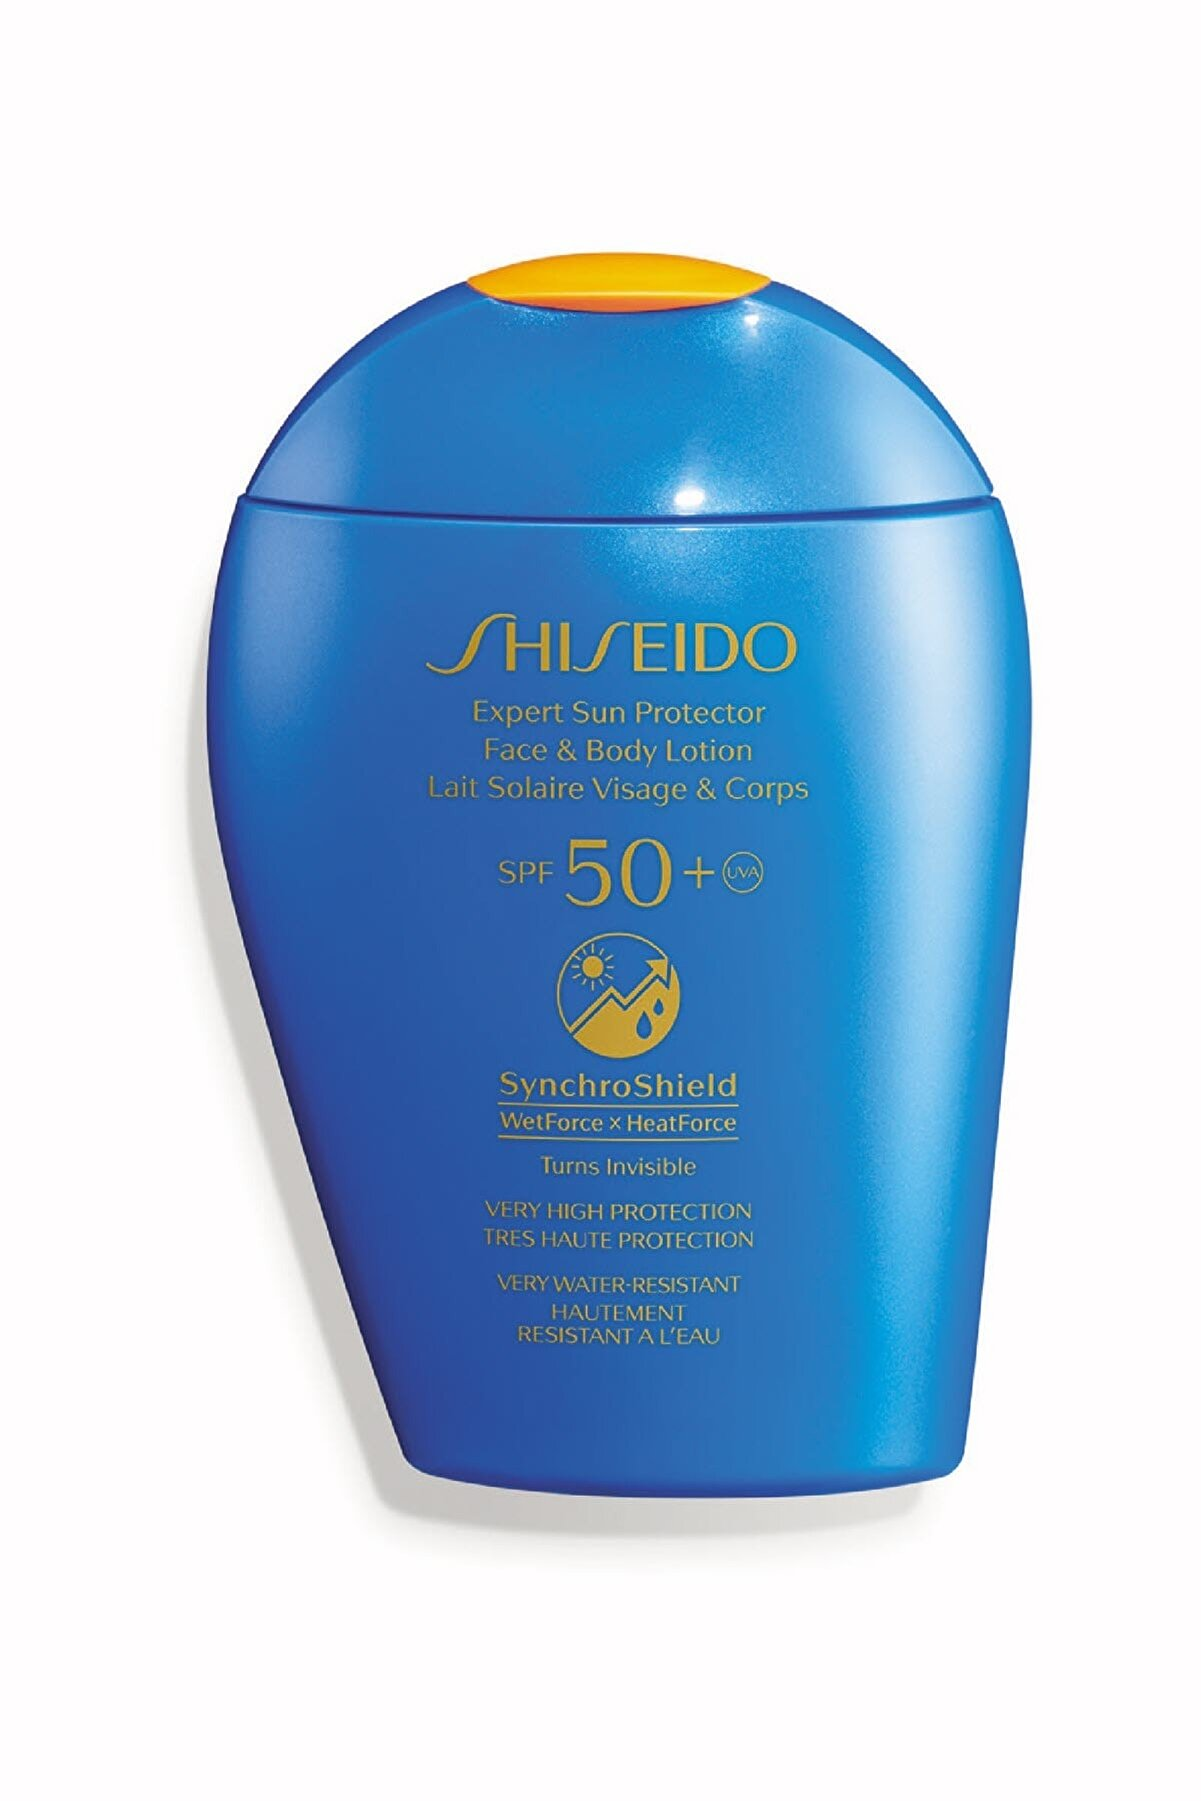 Shiseido Güneş Losyonu - Expert Sun Protector Lotion SPF 50 768614156734